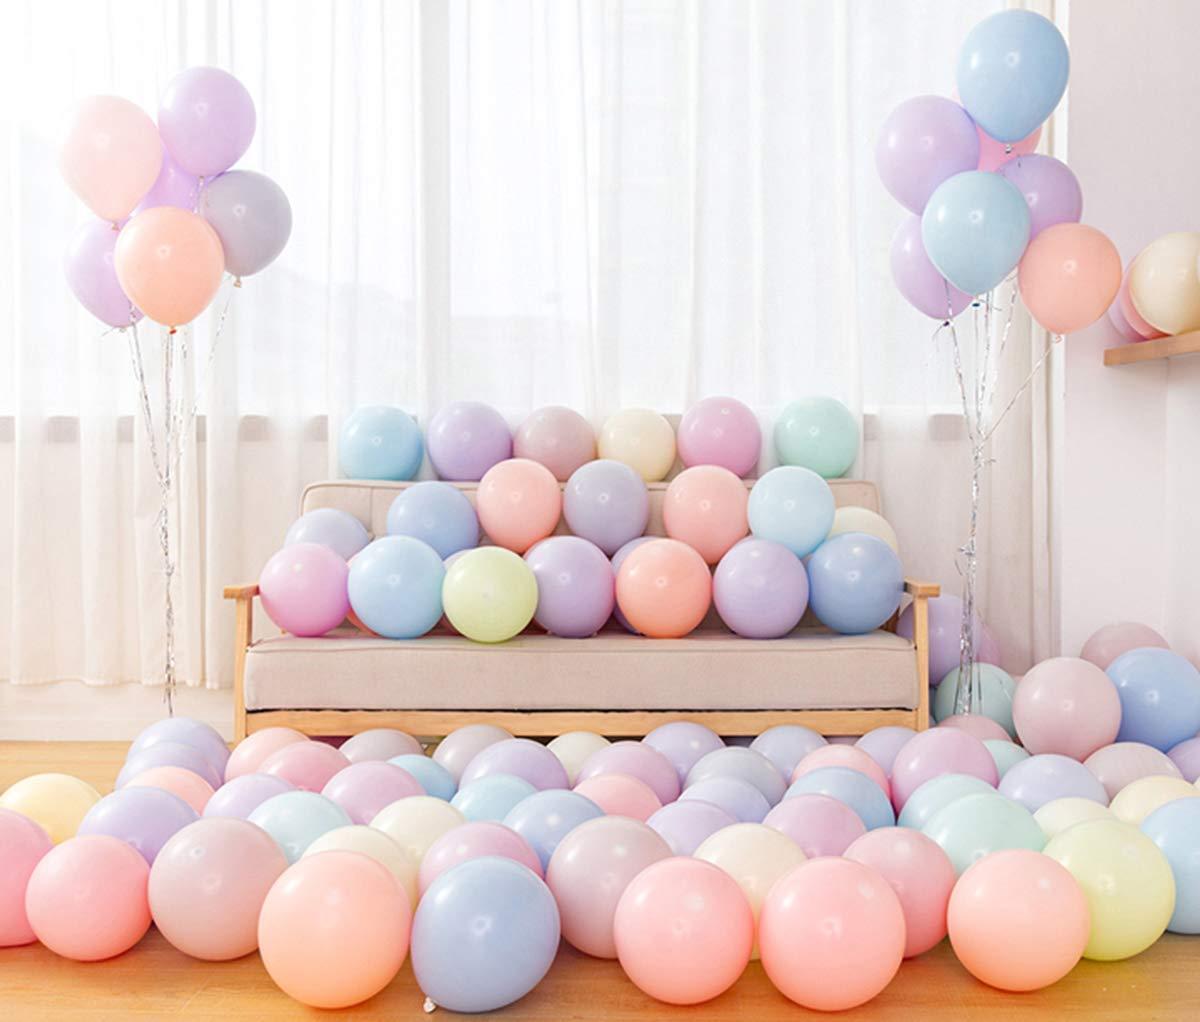 100-PACK Sunshine smile Luftballons Pastell,Bunte Luftballons,Helium Luftballons,Latex Luftballons,Farbige Ballons,Partyballon,Dekorative Ballons f/ür Hochzeit Weihnachten